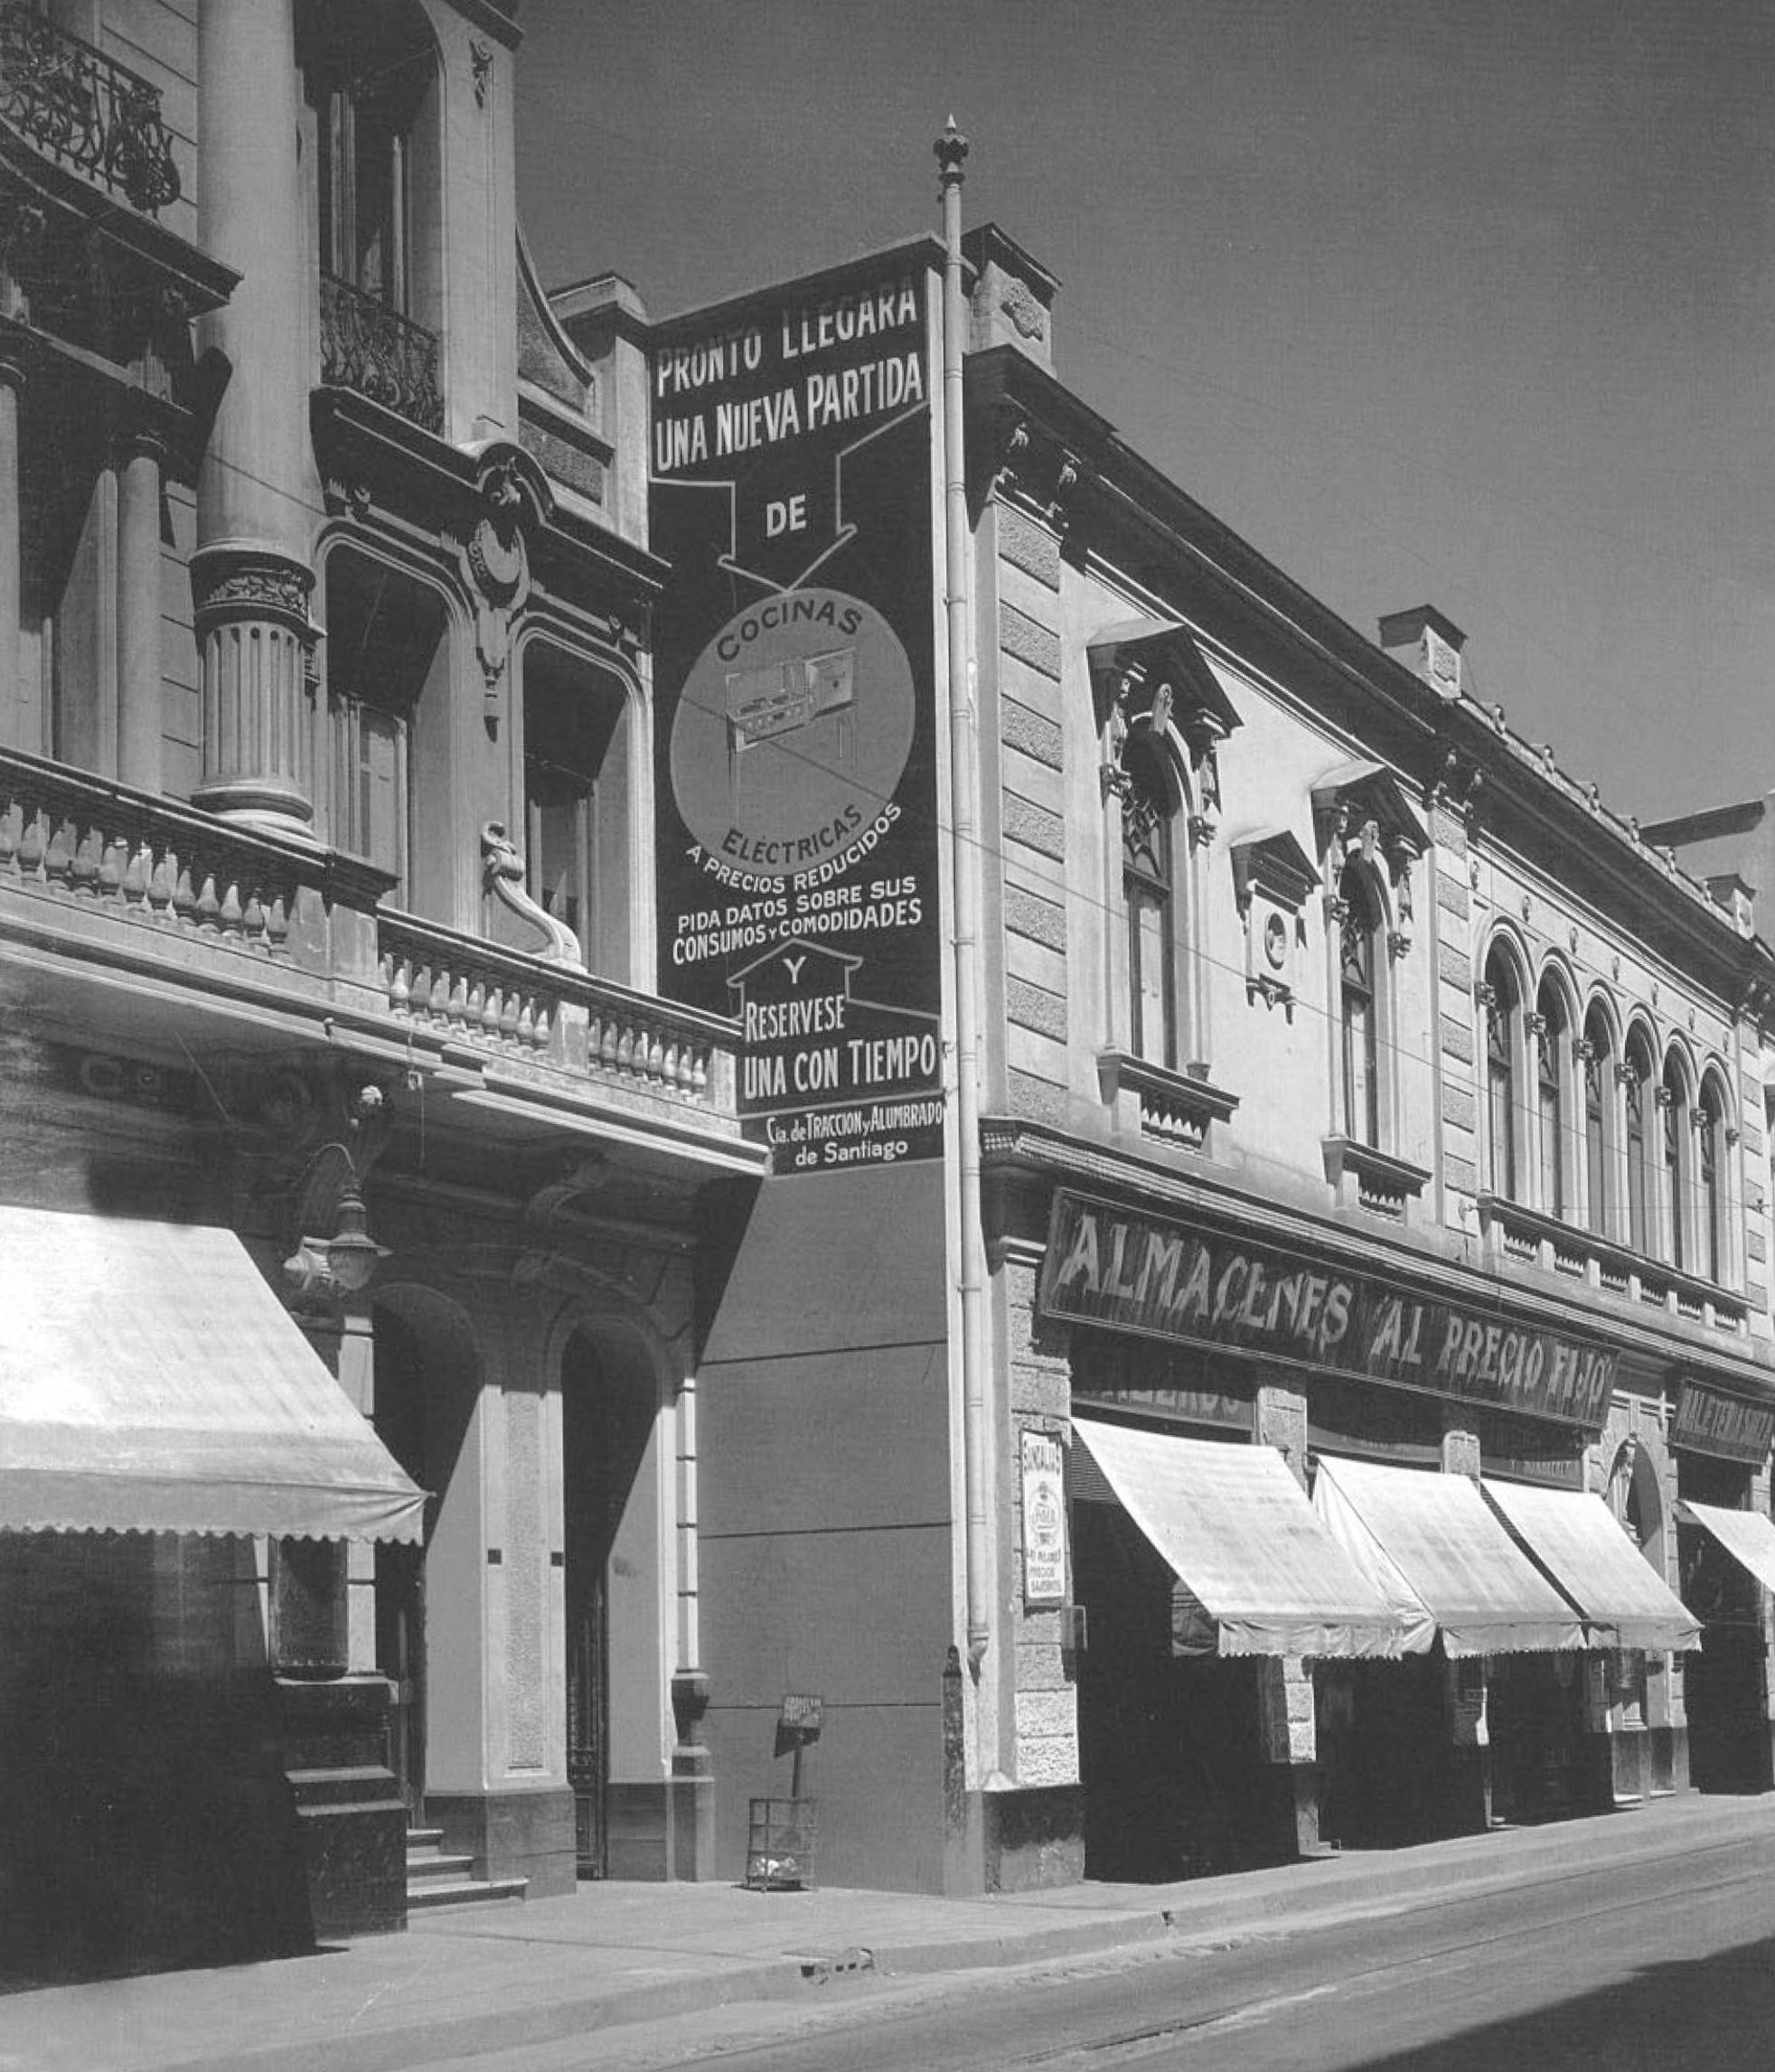 Enterreno - Fotos históricas de chile - fotos antiguas de Chile - Calle Ahumada, año 1927